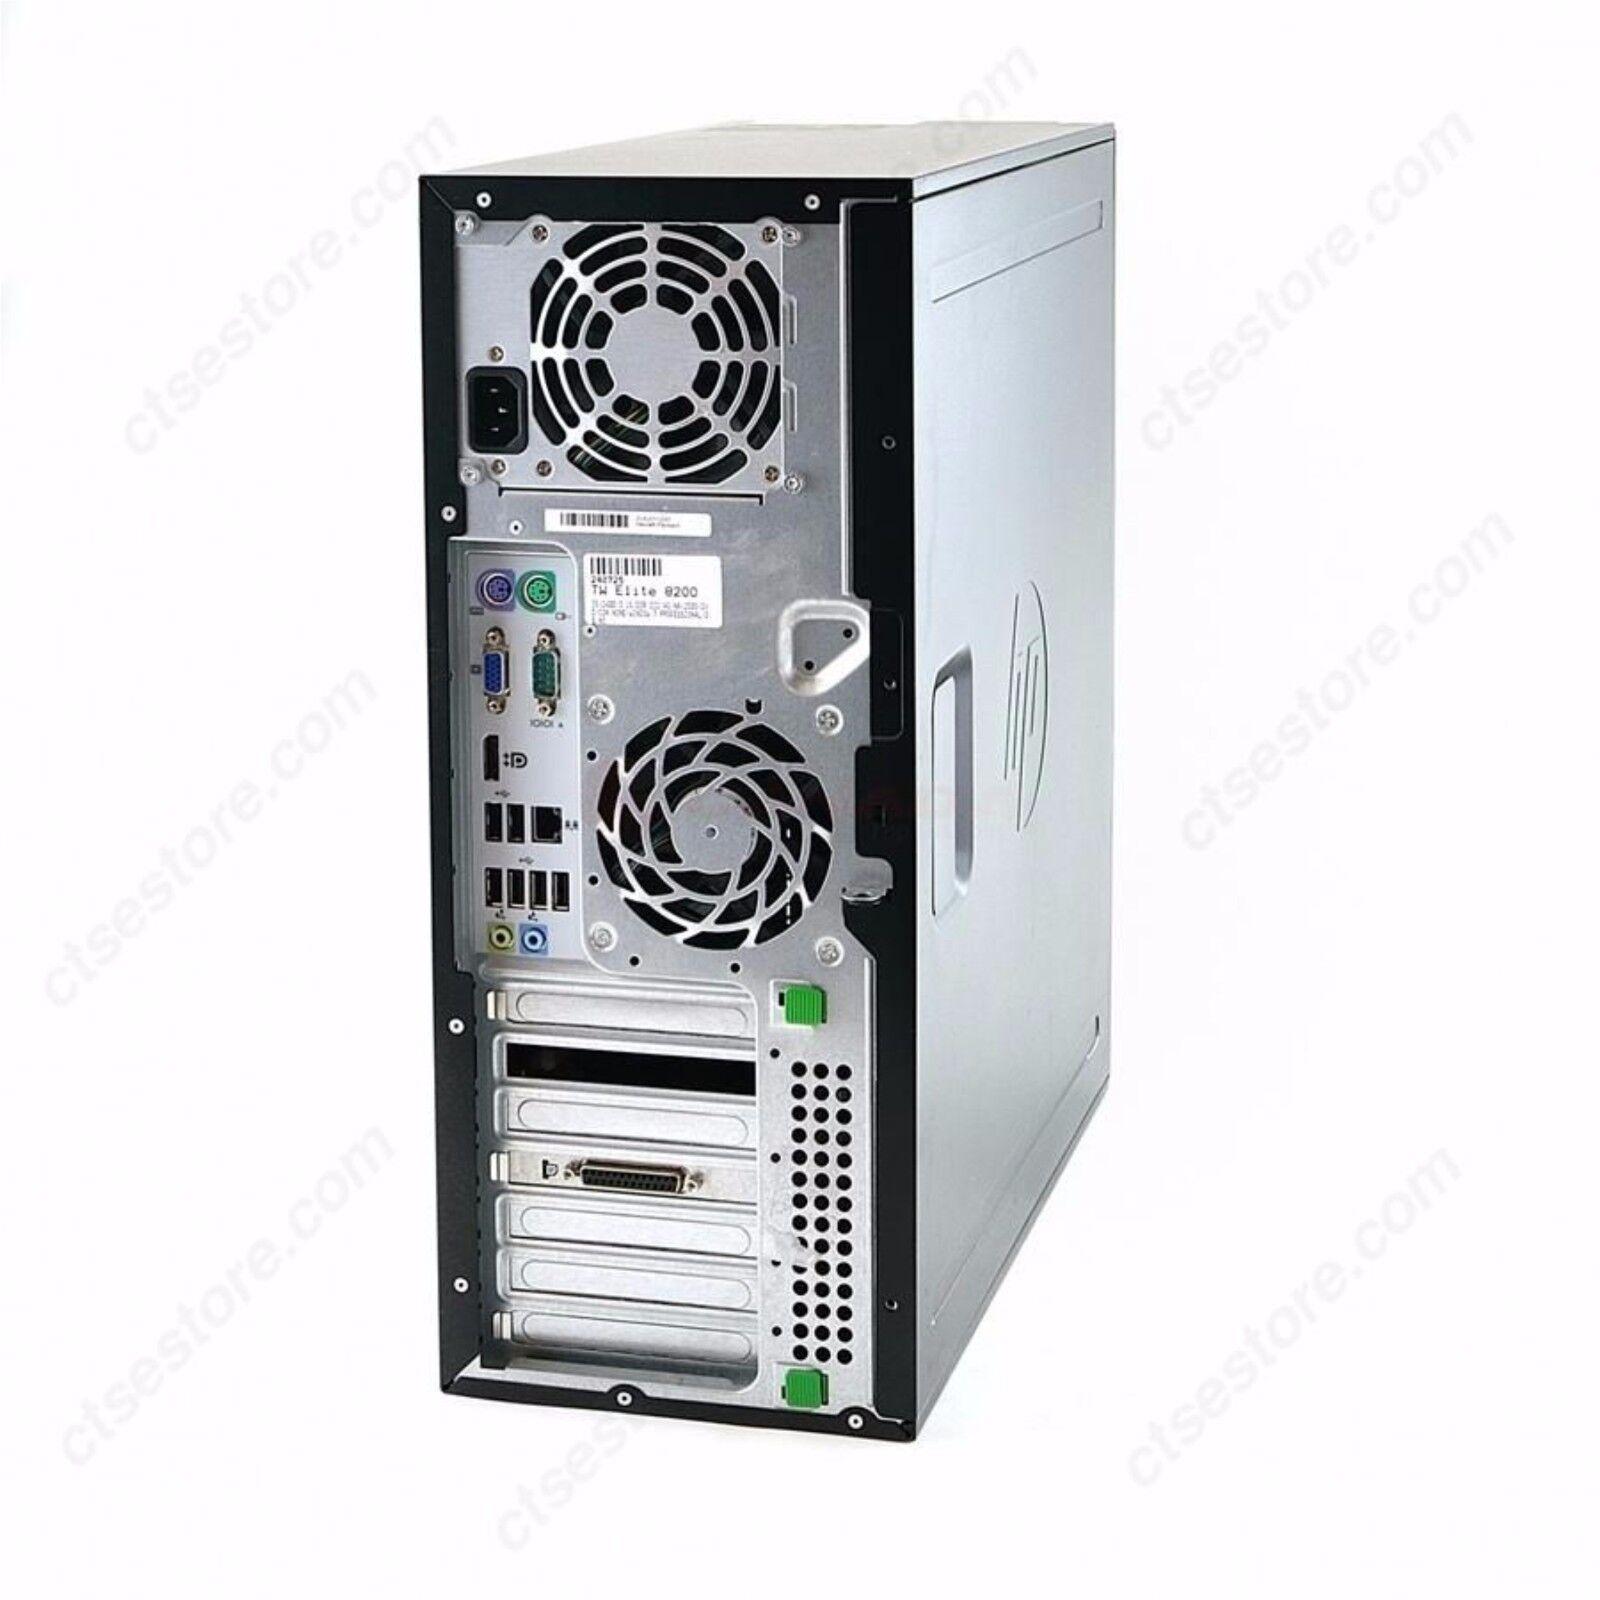 HP 8200 Elite Desktop Computer PC Tower i7 3.40GHz 16GB 1TB Windows 10 Pro 64Bit